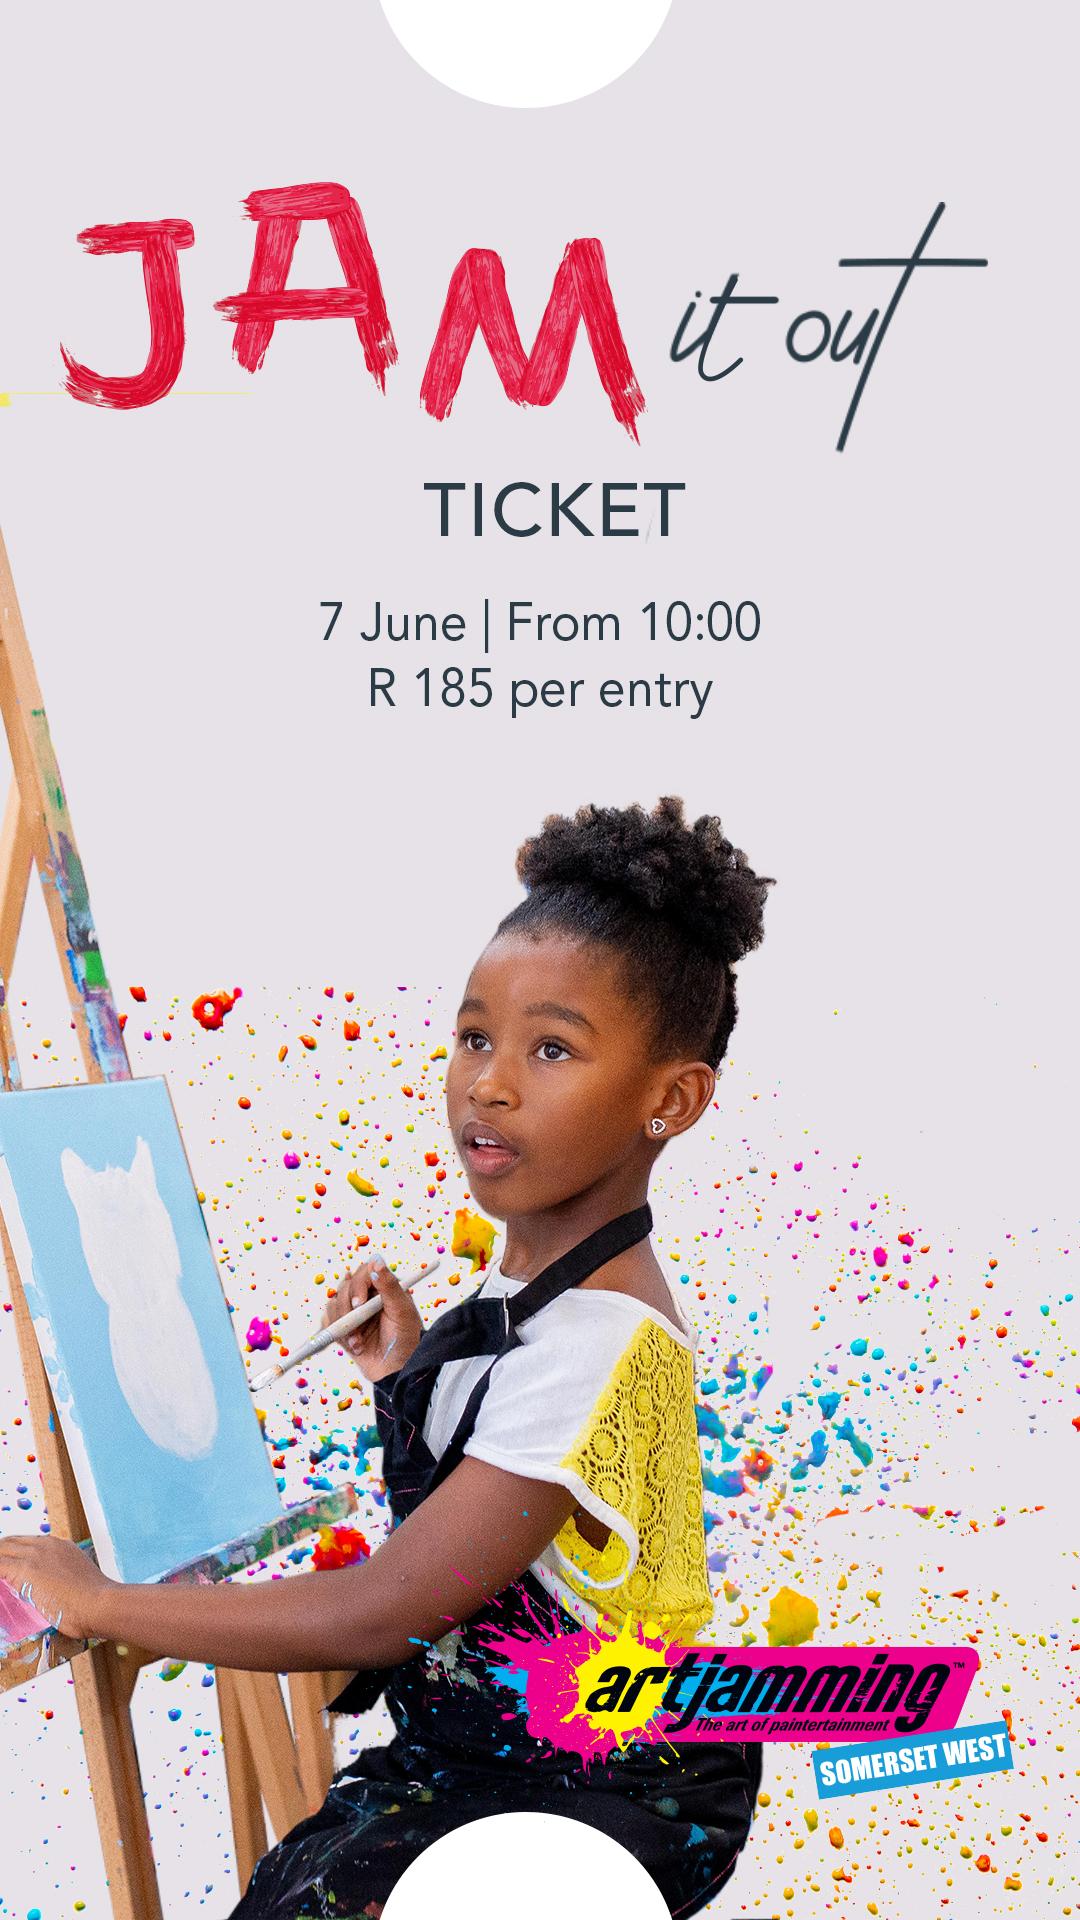 Art Jamming – Ticket Entry